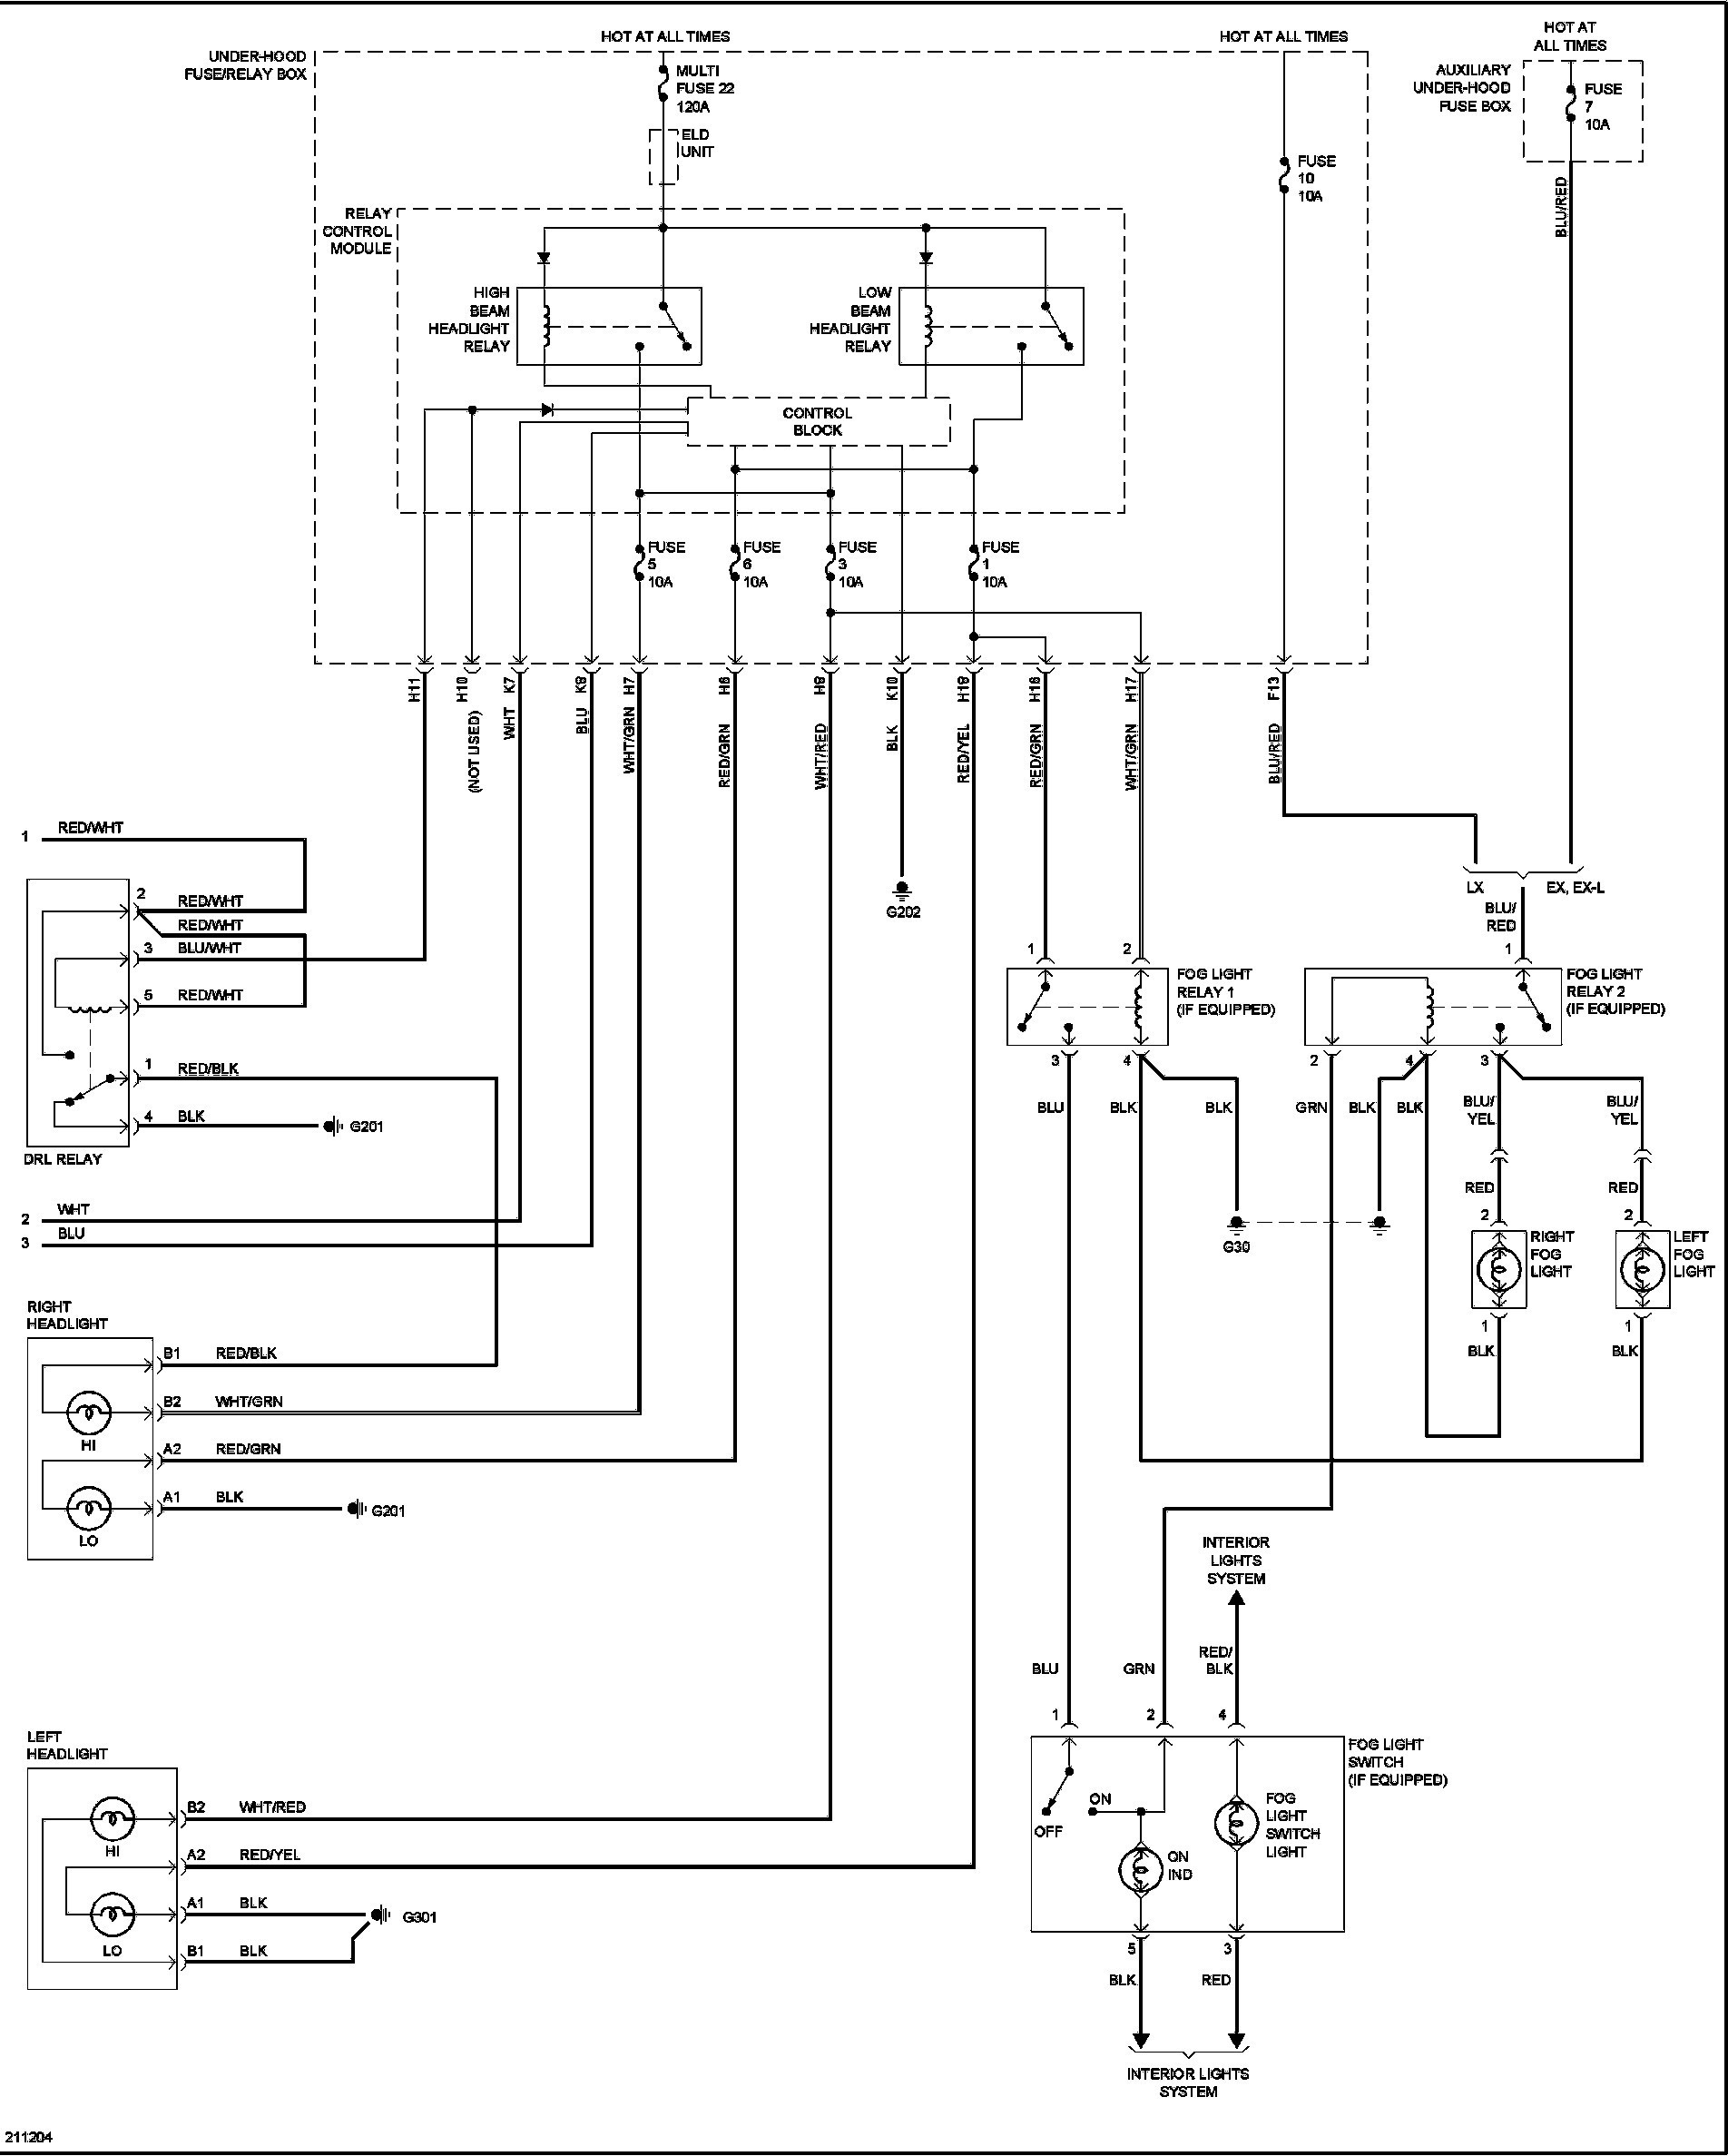 2000 Civic Engine Diagram 1995 Honda Odyssey Wiring Diagrams Wiring Data Of 2000 Civic Engine Diagram